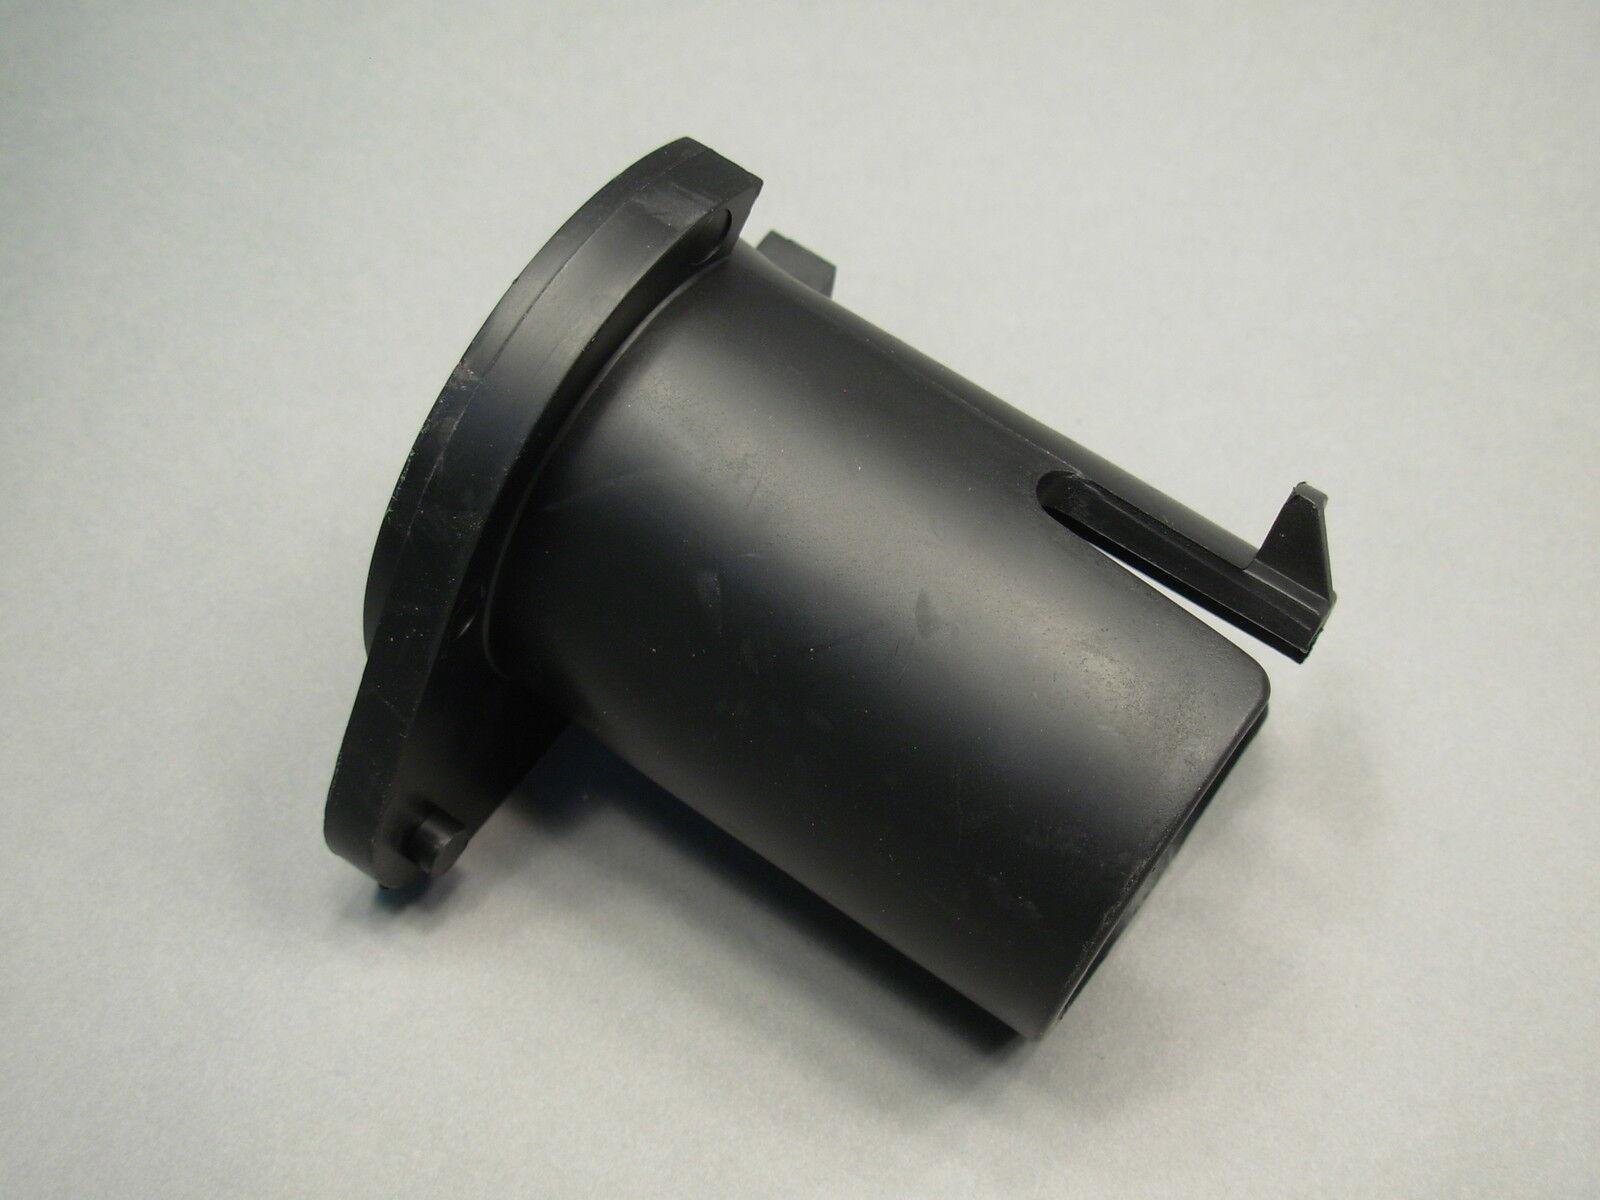 M15445-1 2 Lincoln Mig Welder Wire Reel Spindle Spool Holder Drive Brake Parts